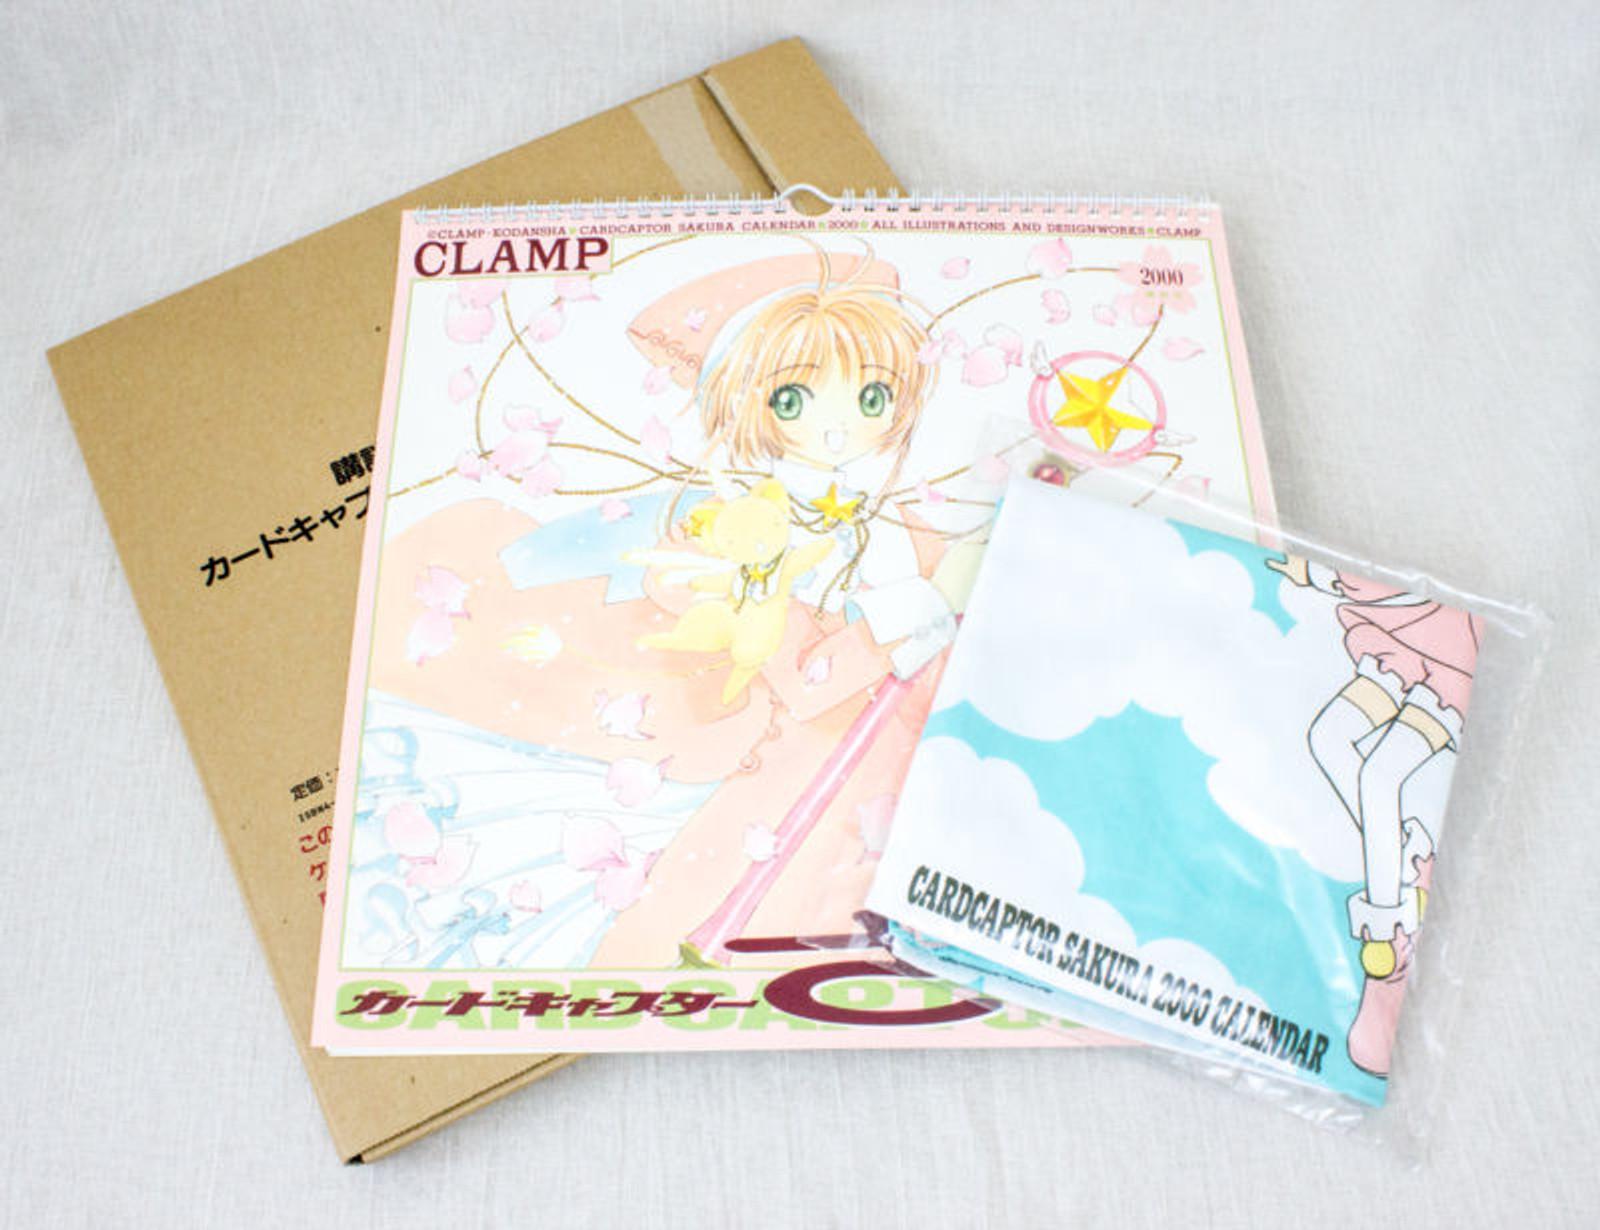 Cardcaptor Sakura Kodansha Calendar 2000 + Drawstring Bag CLAMP JAPAN ANIME MANGA